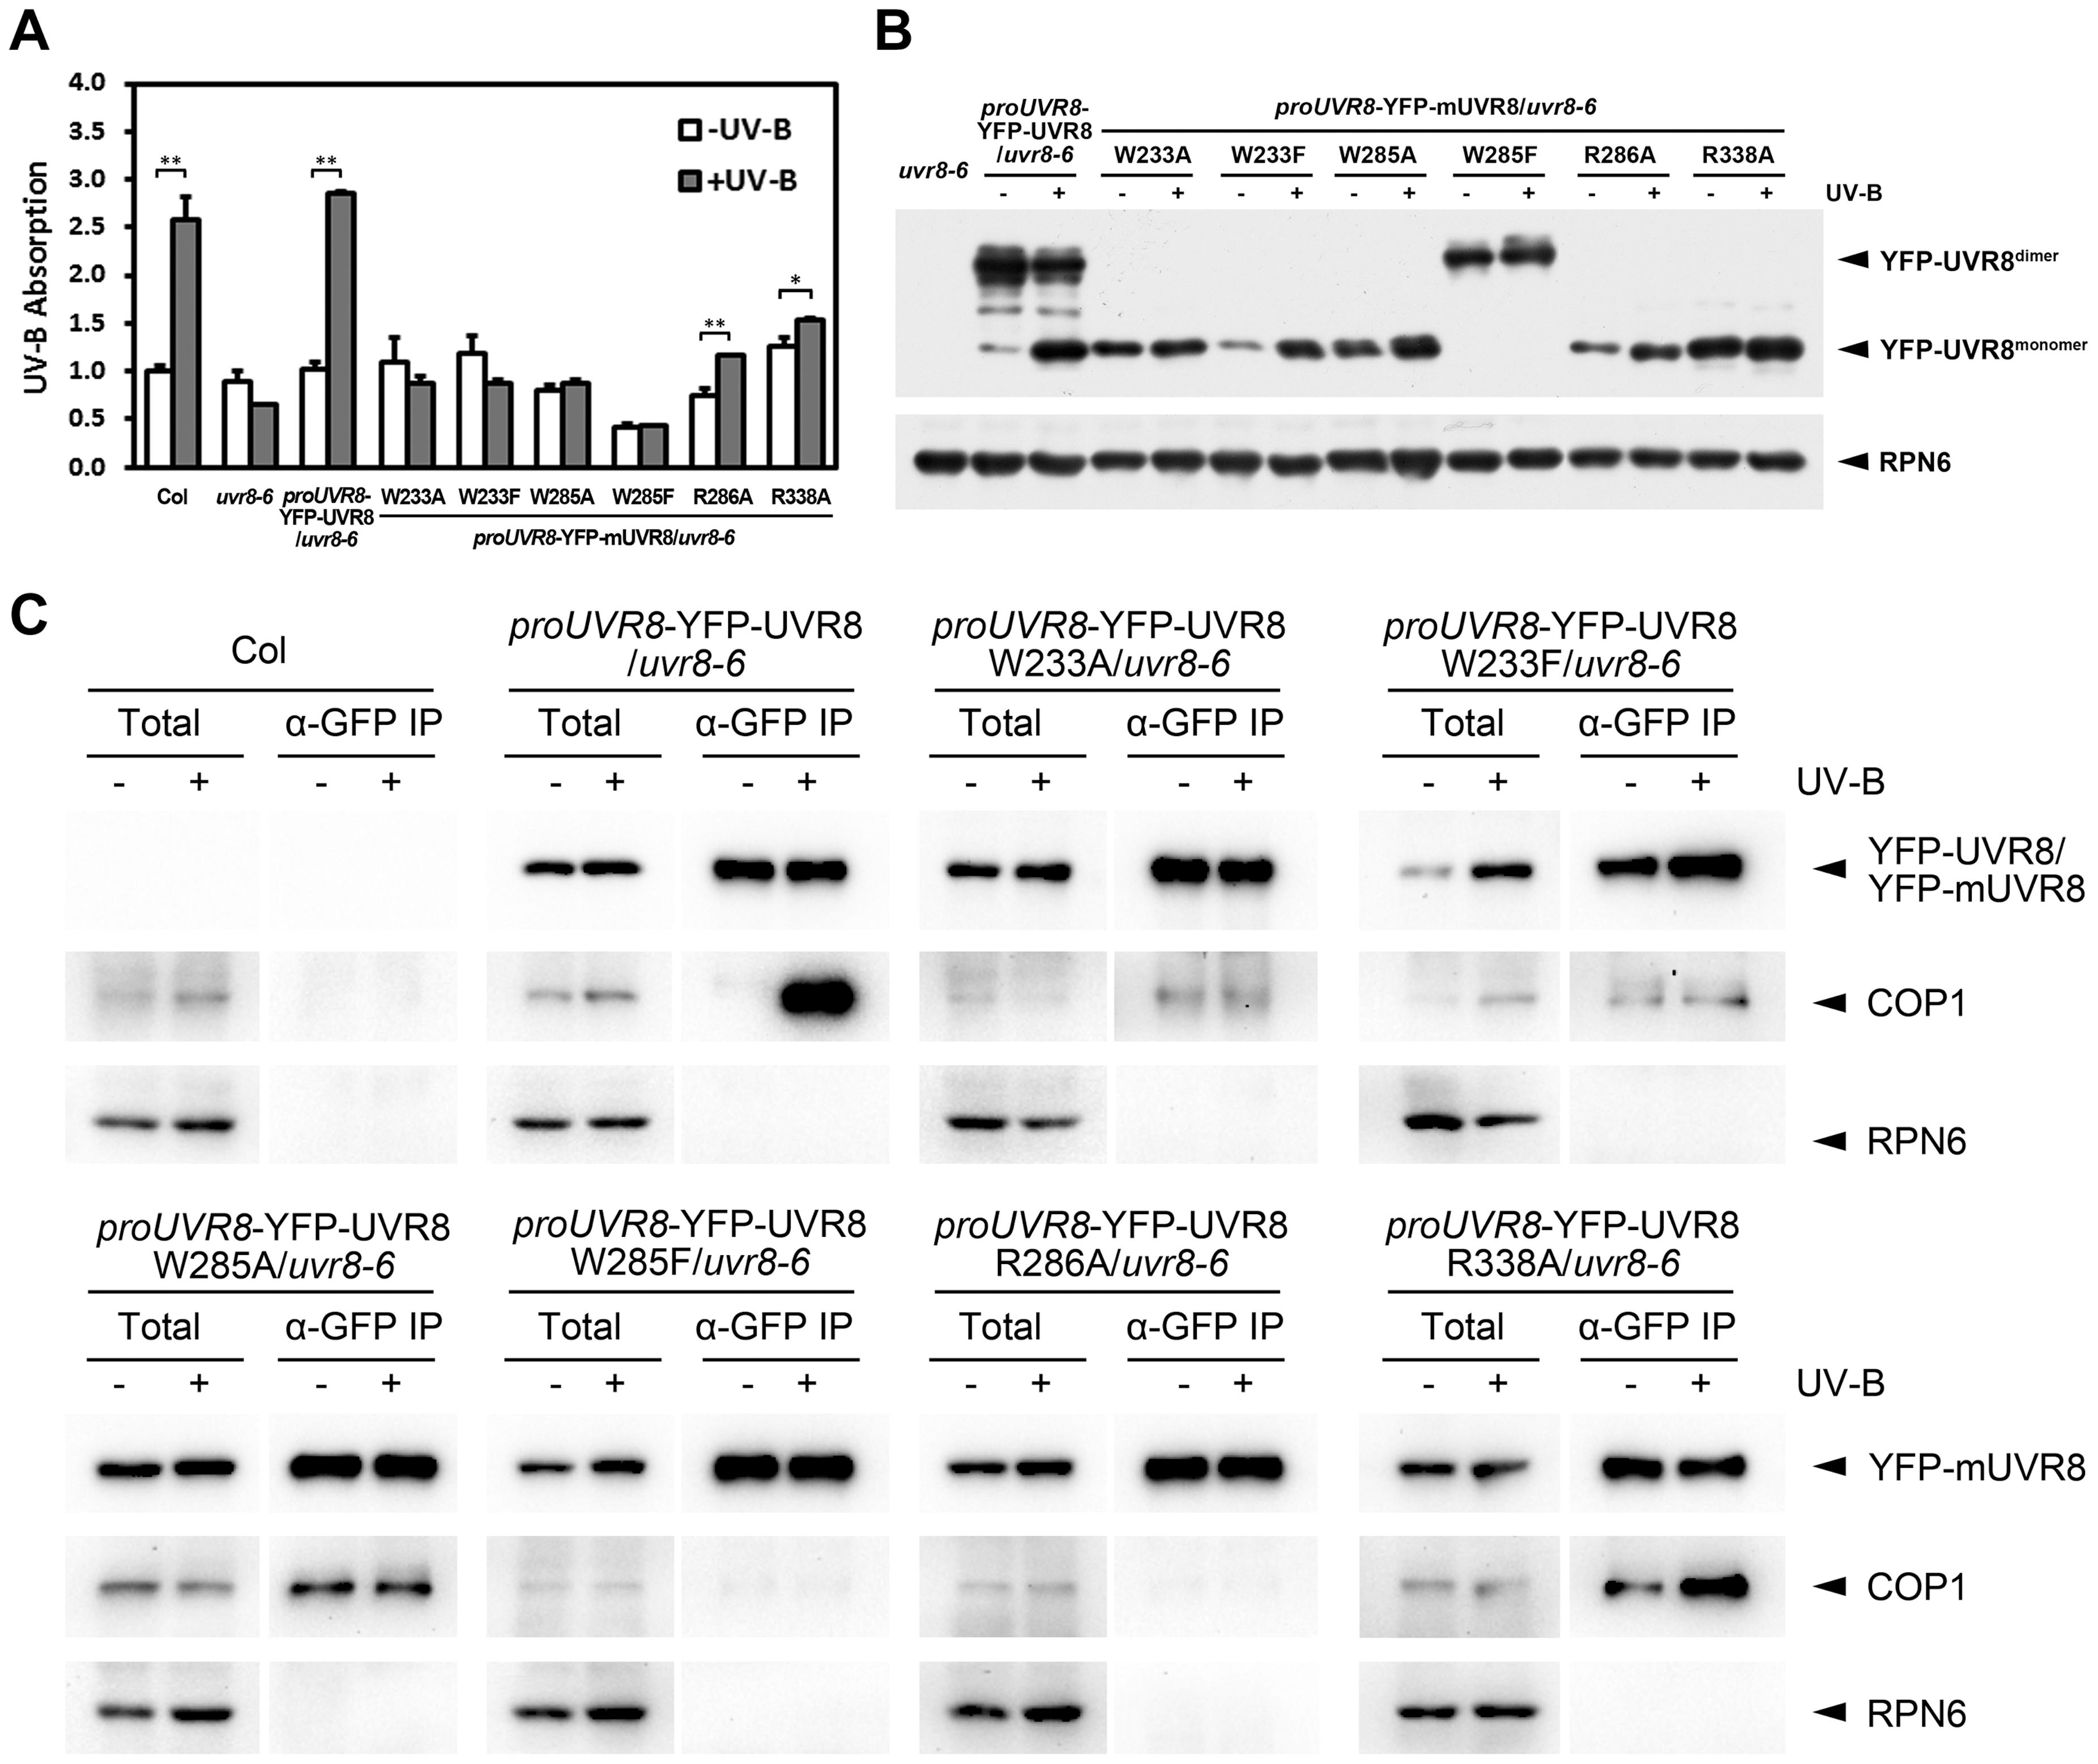 UVR8 mutations affect UV-B light perception, UVR8 monomerization and UVR8-COP1 association.